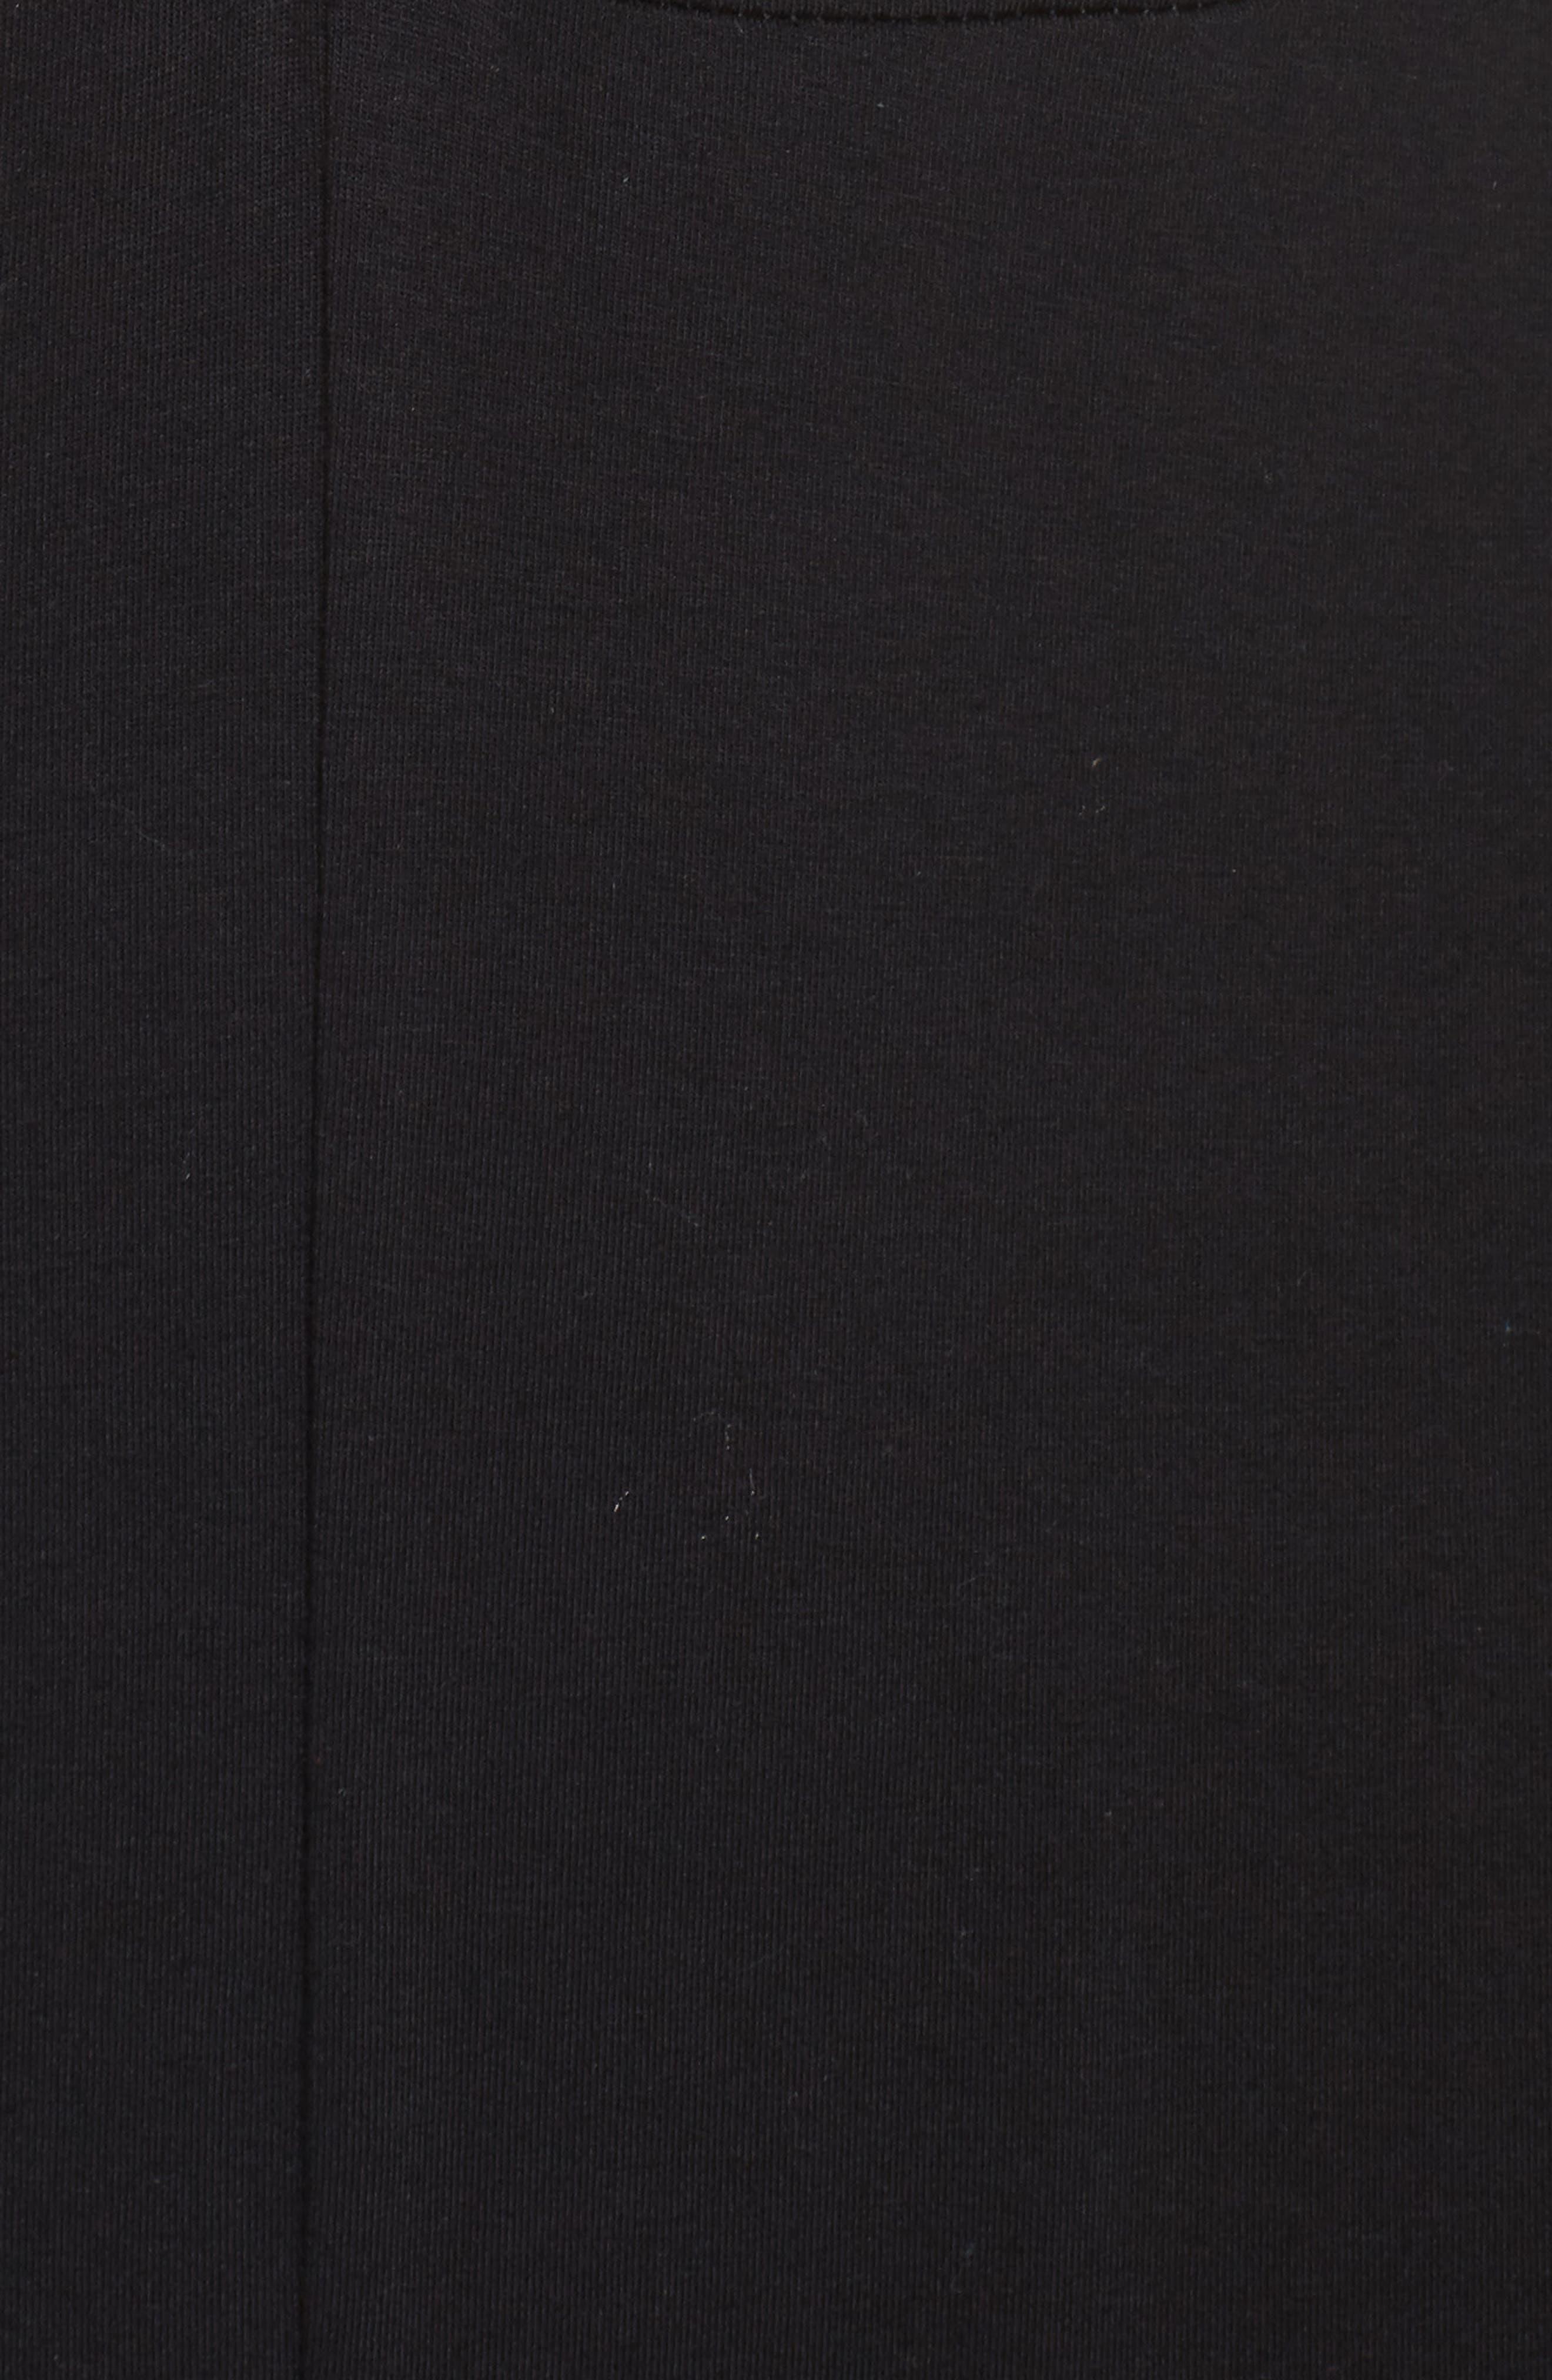 Roseann Jumpsuit,                             Alternate thumbnail 6, color,                             Black/ Grey Heather/ White